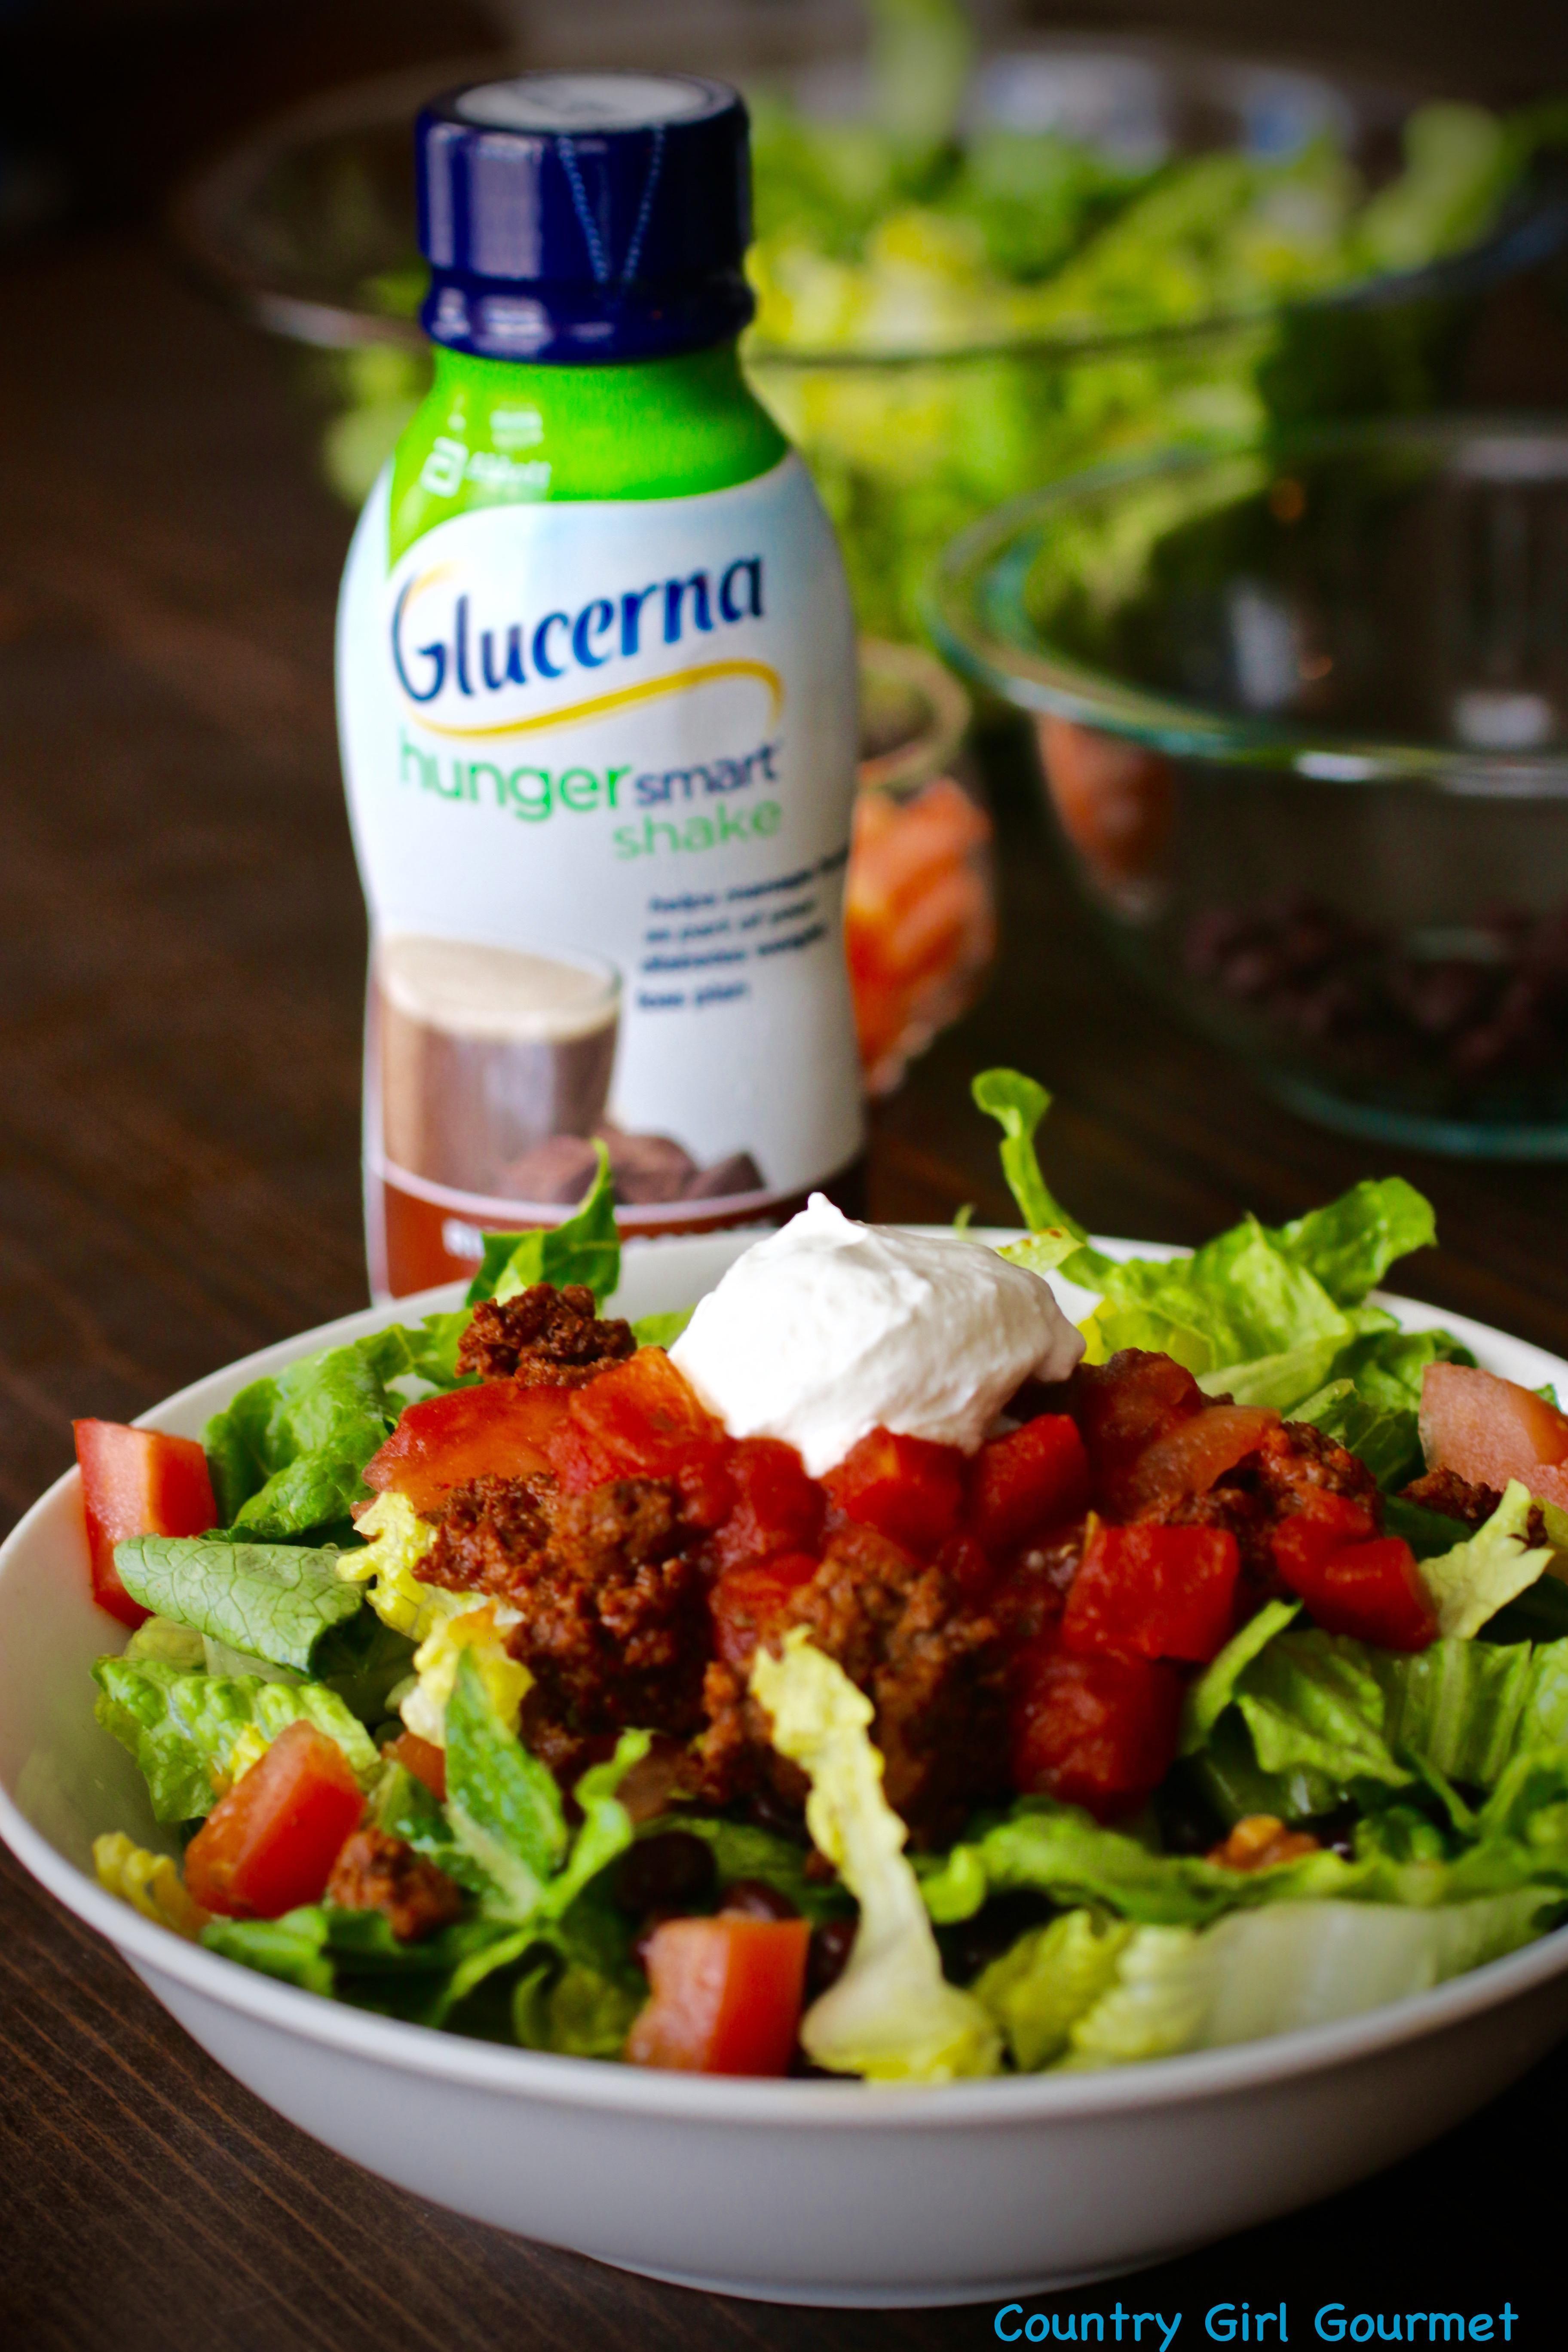 Diabetes, Taco Salad, And Glucerna